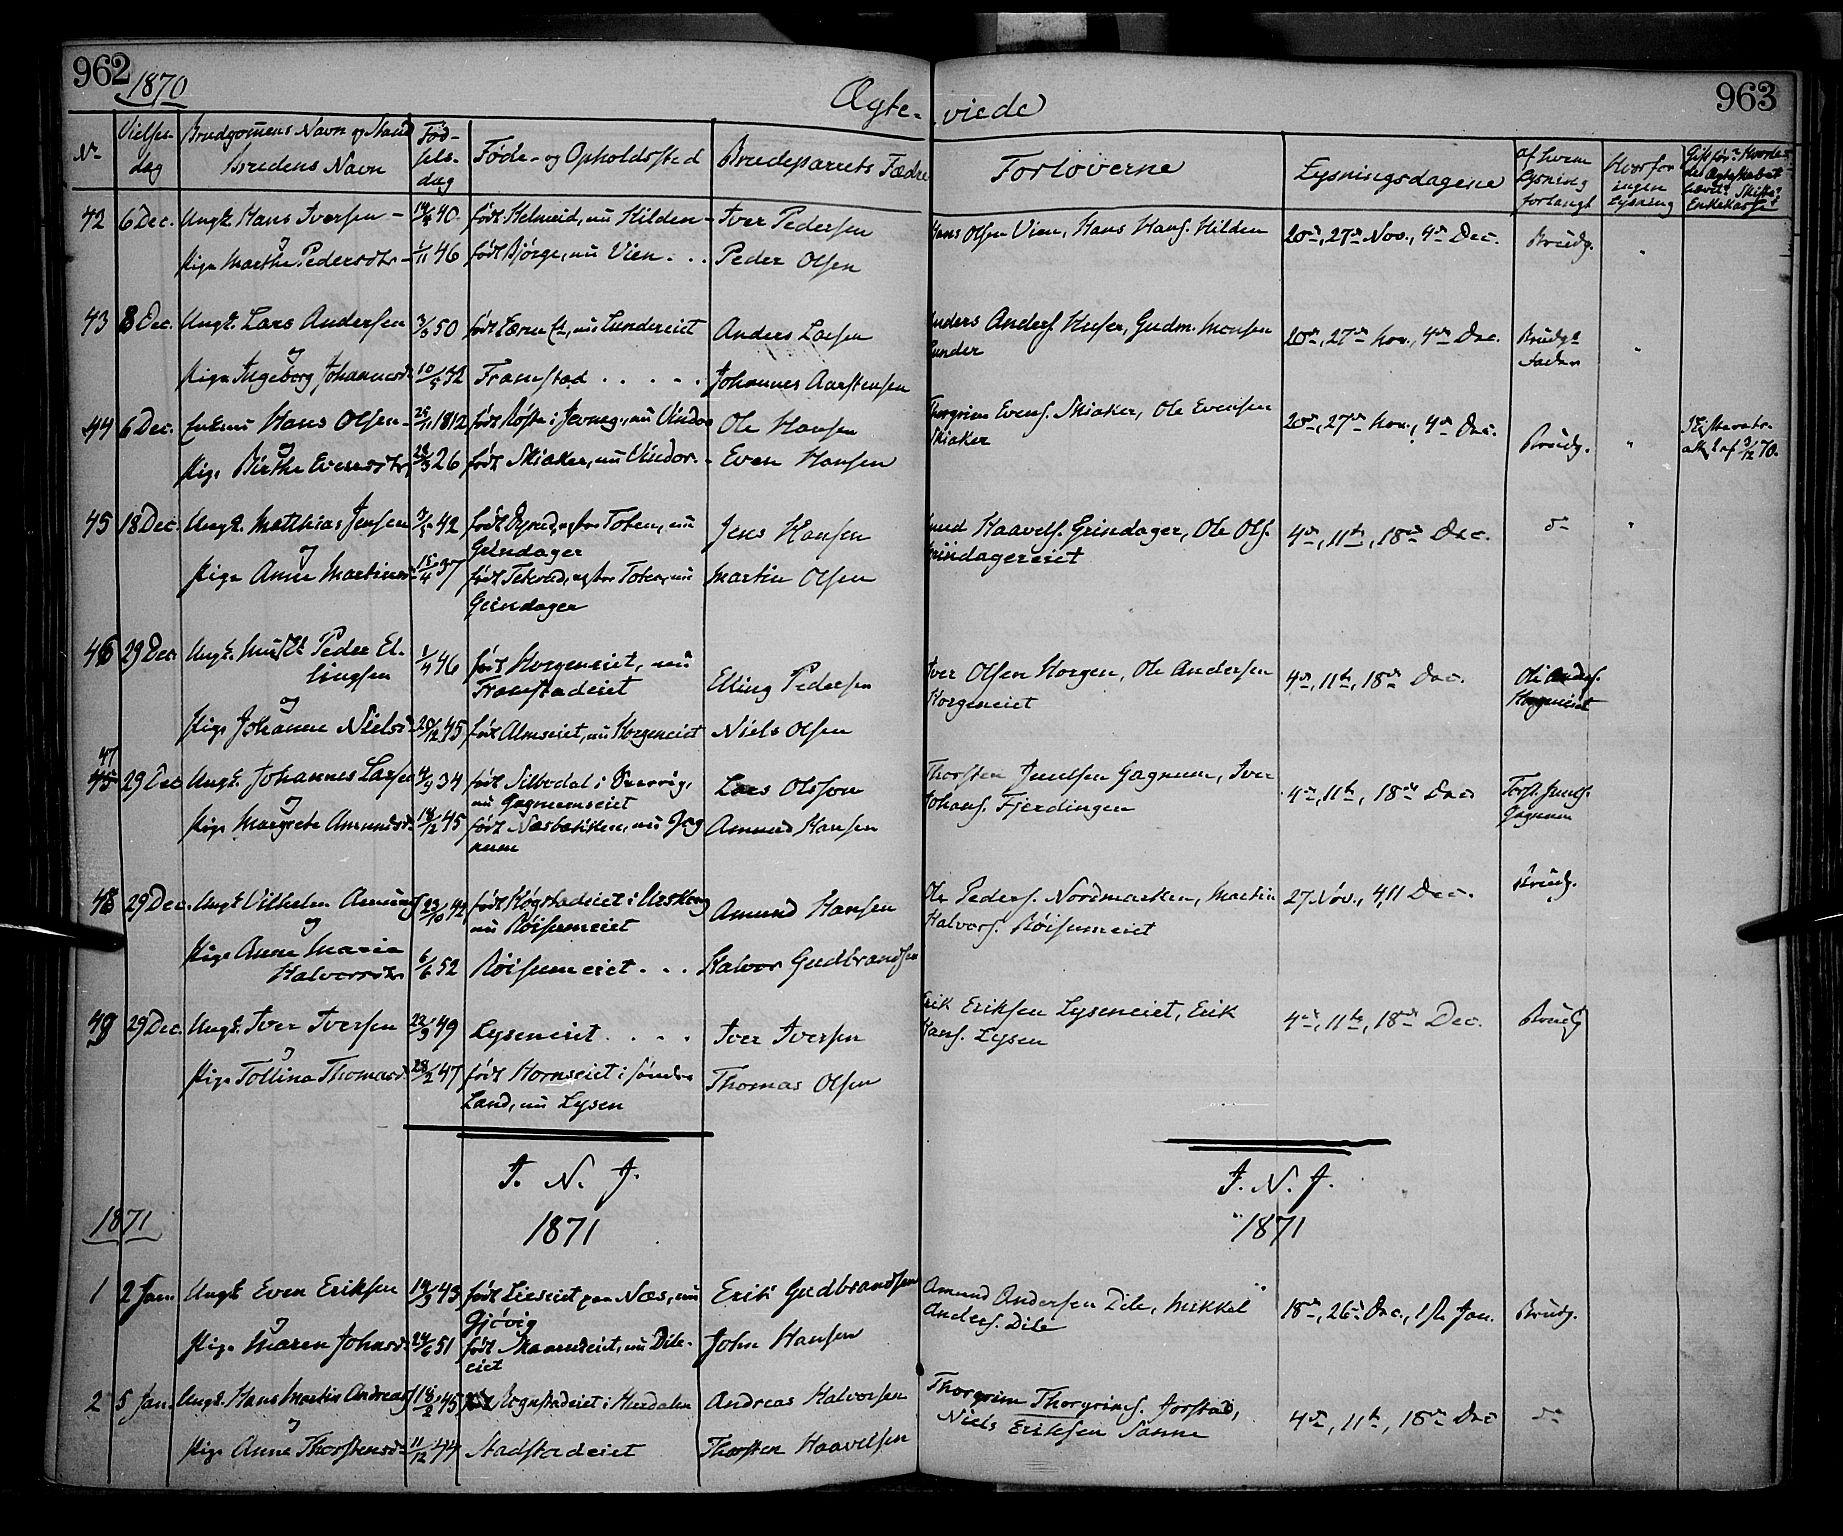 SAH, Gran prestekontor, Ministerialbok nr. 12, 1856-1874, s. 962-963